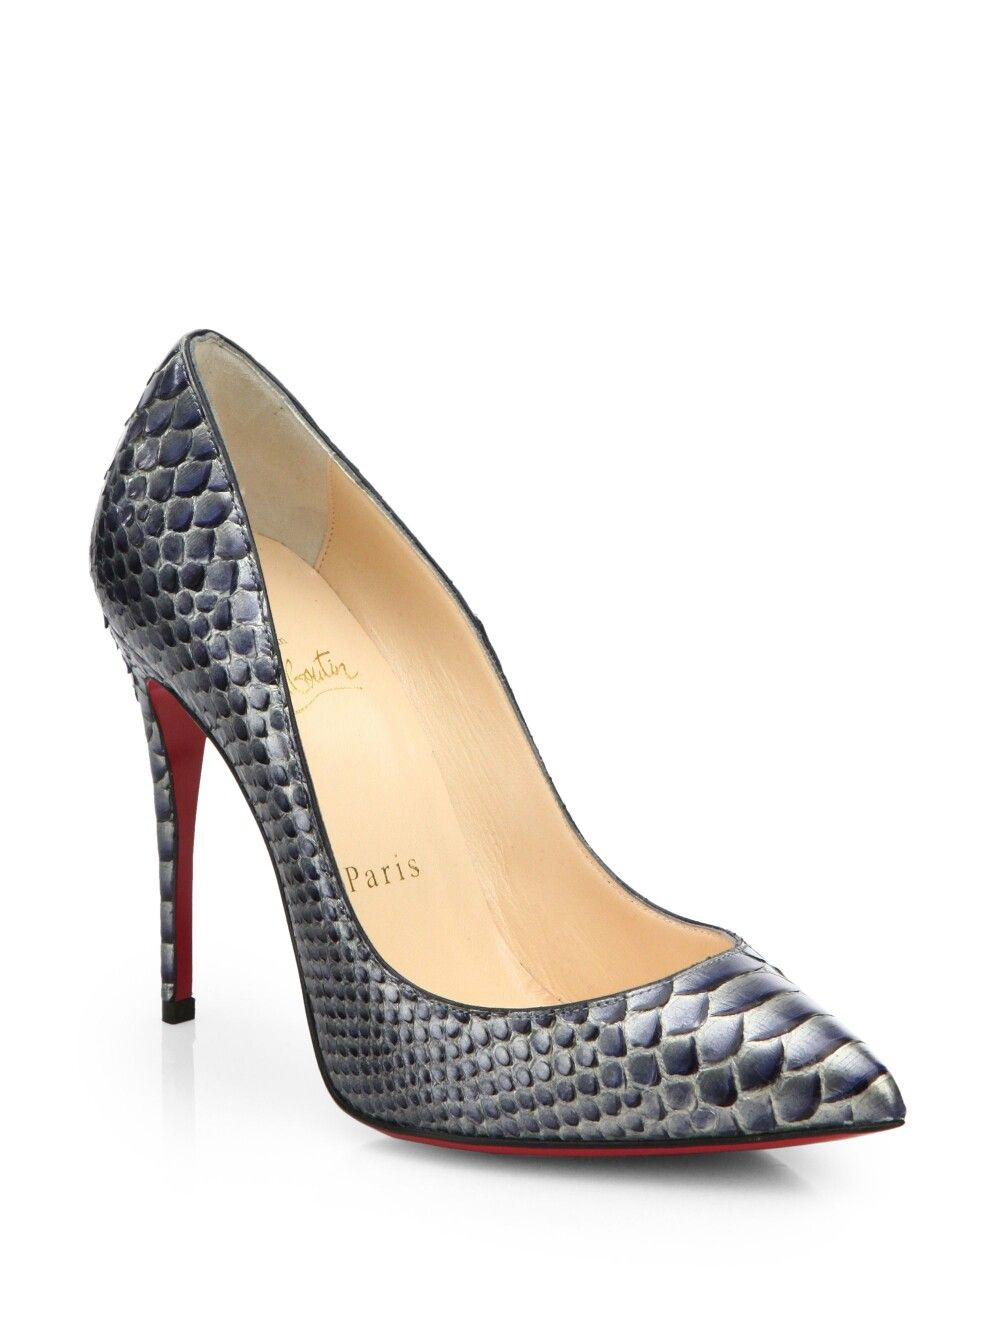 75a3bbb21fe Christian Louboutin Pigalle Follies snake skin heels via Lyst.com ...